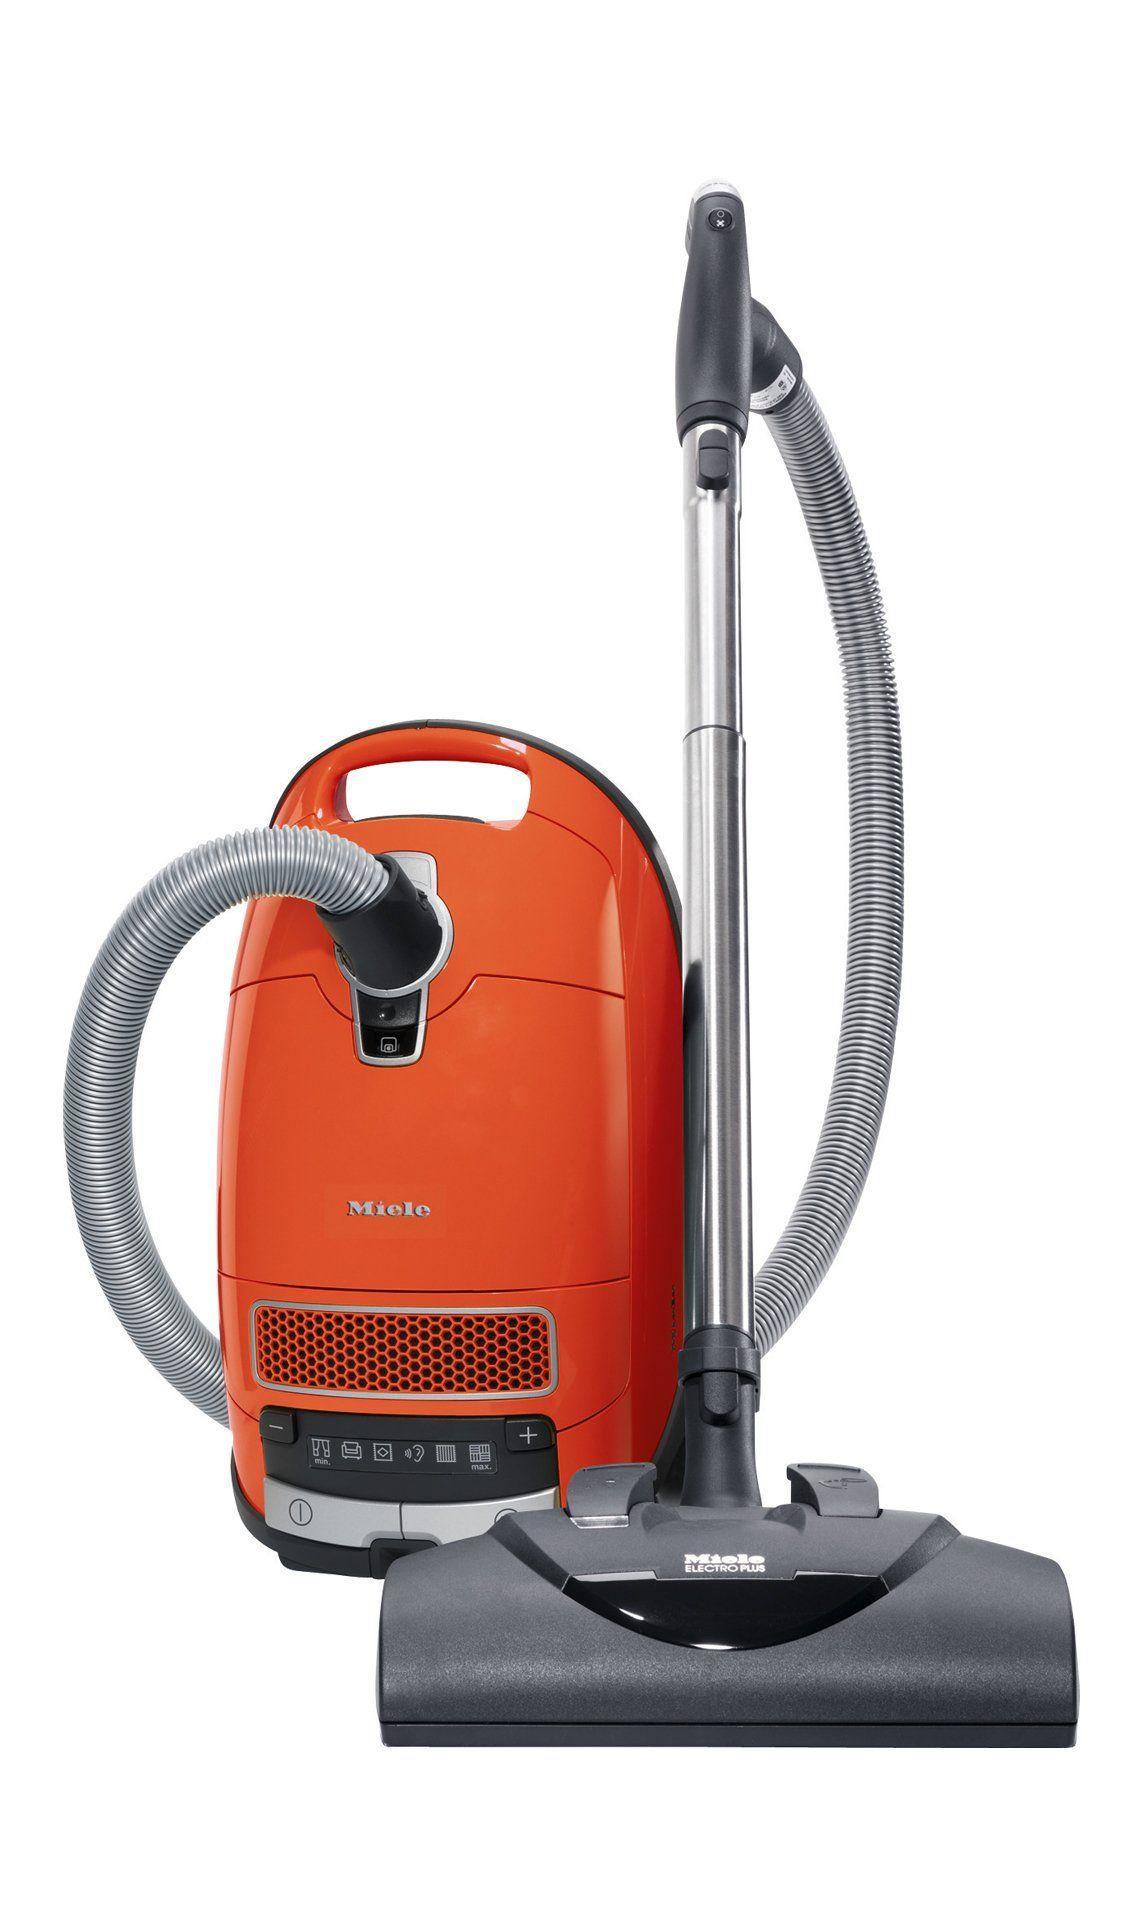 Vacuums, Miele vacuum, Canister vacuum